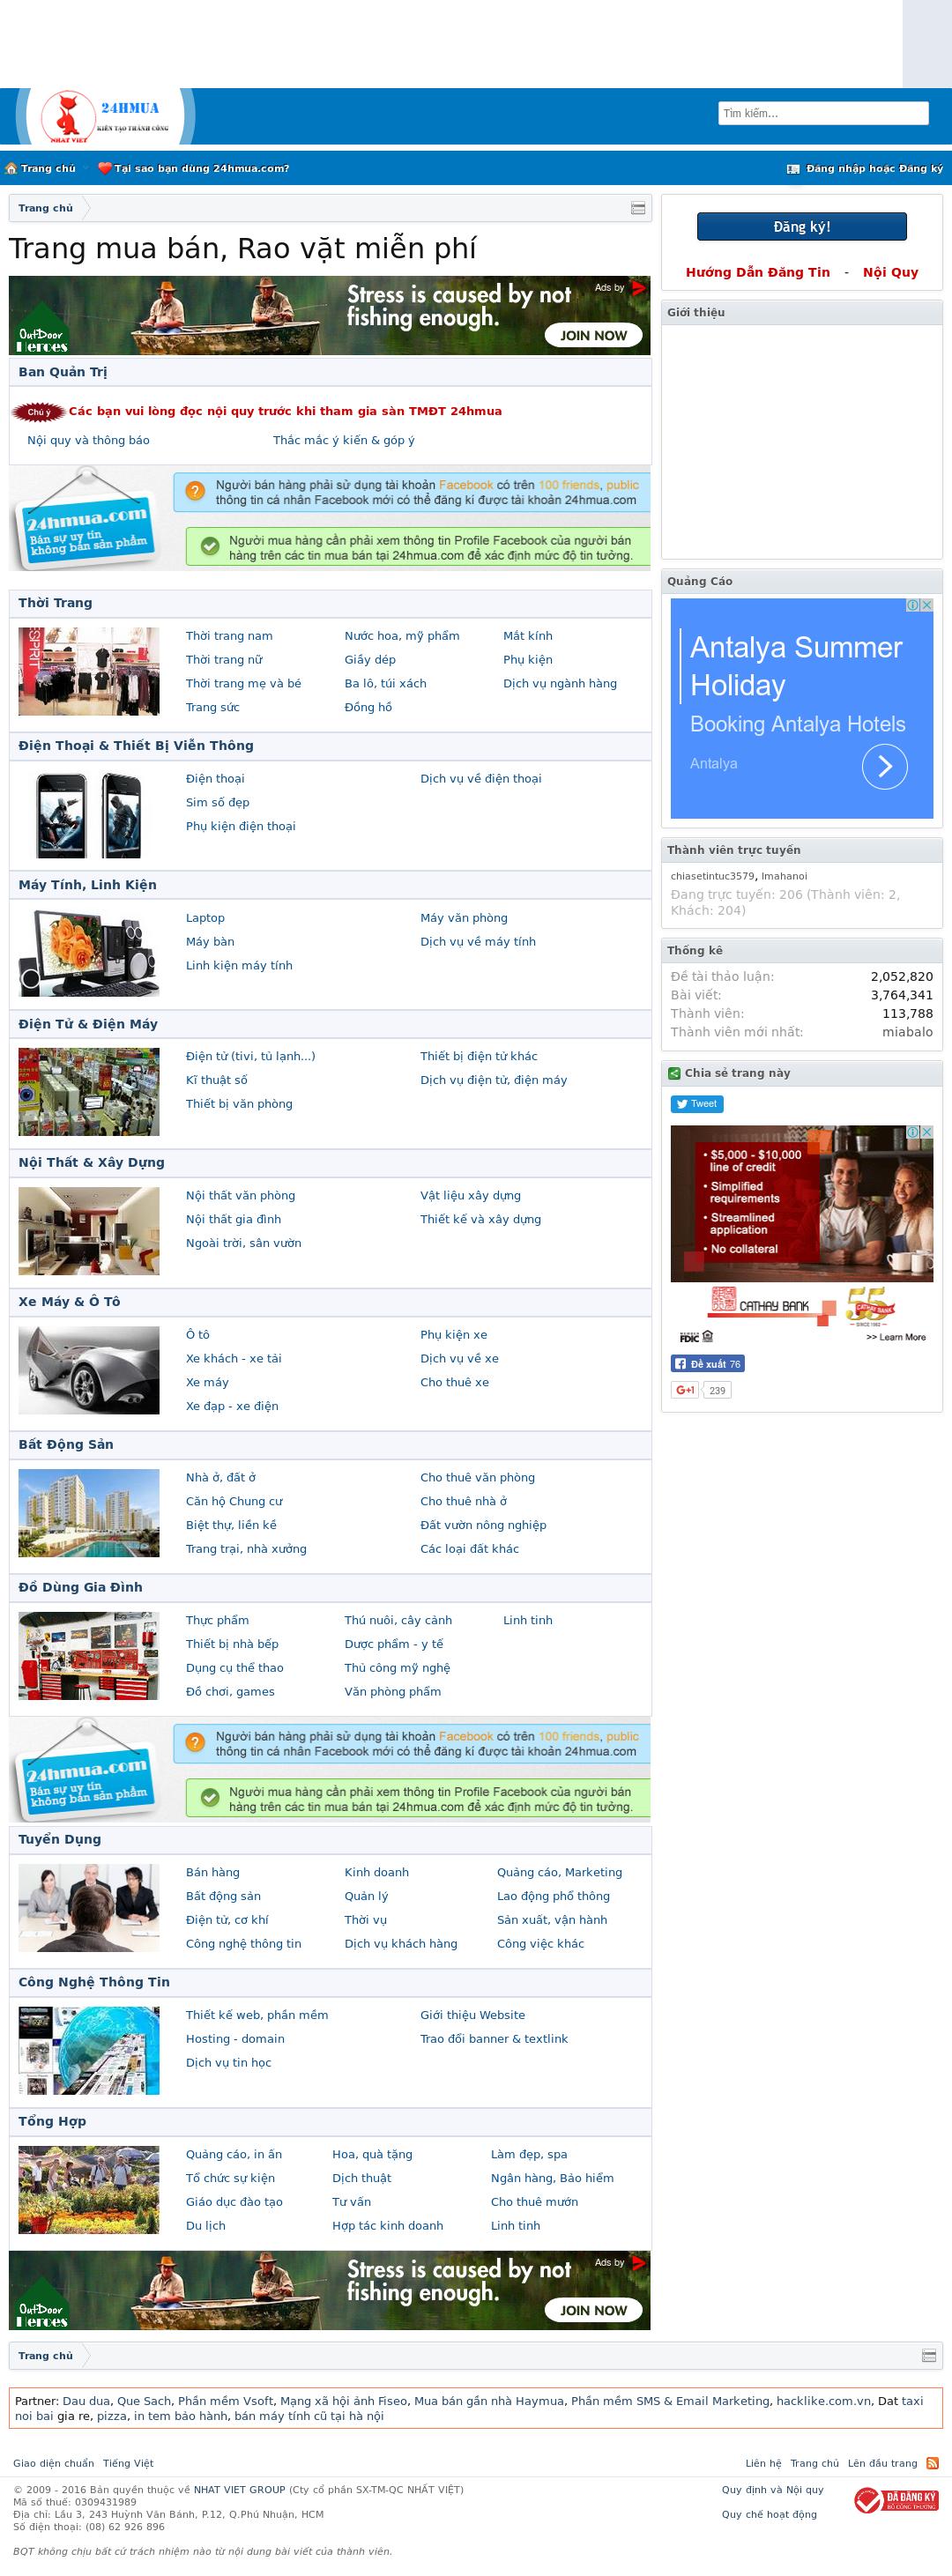 24Hmua website history